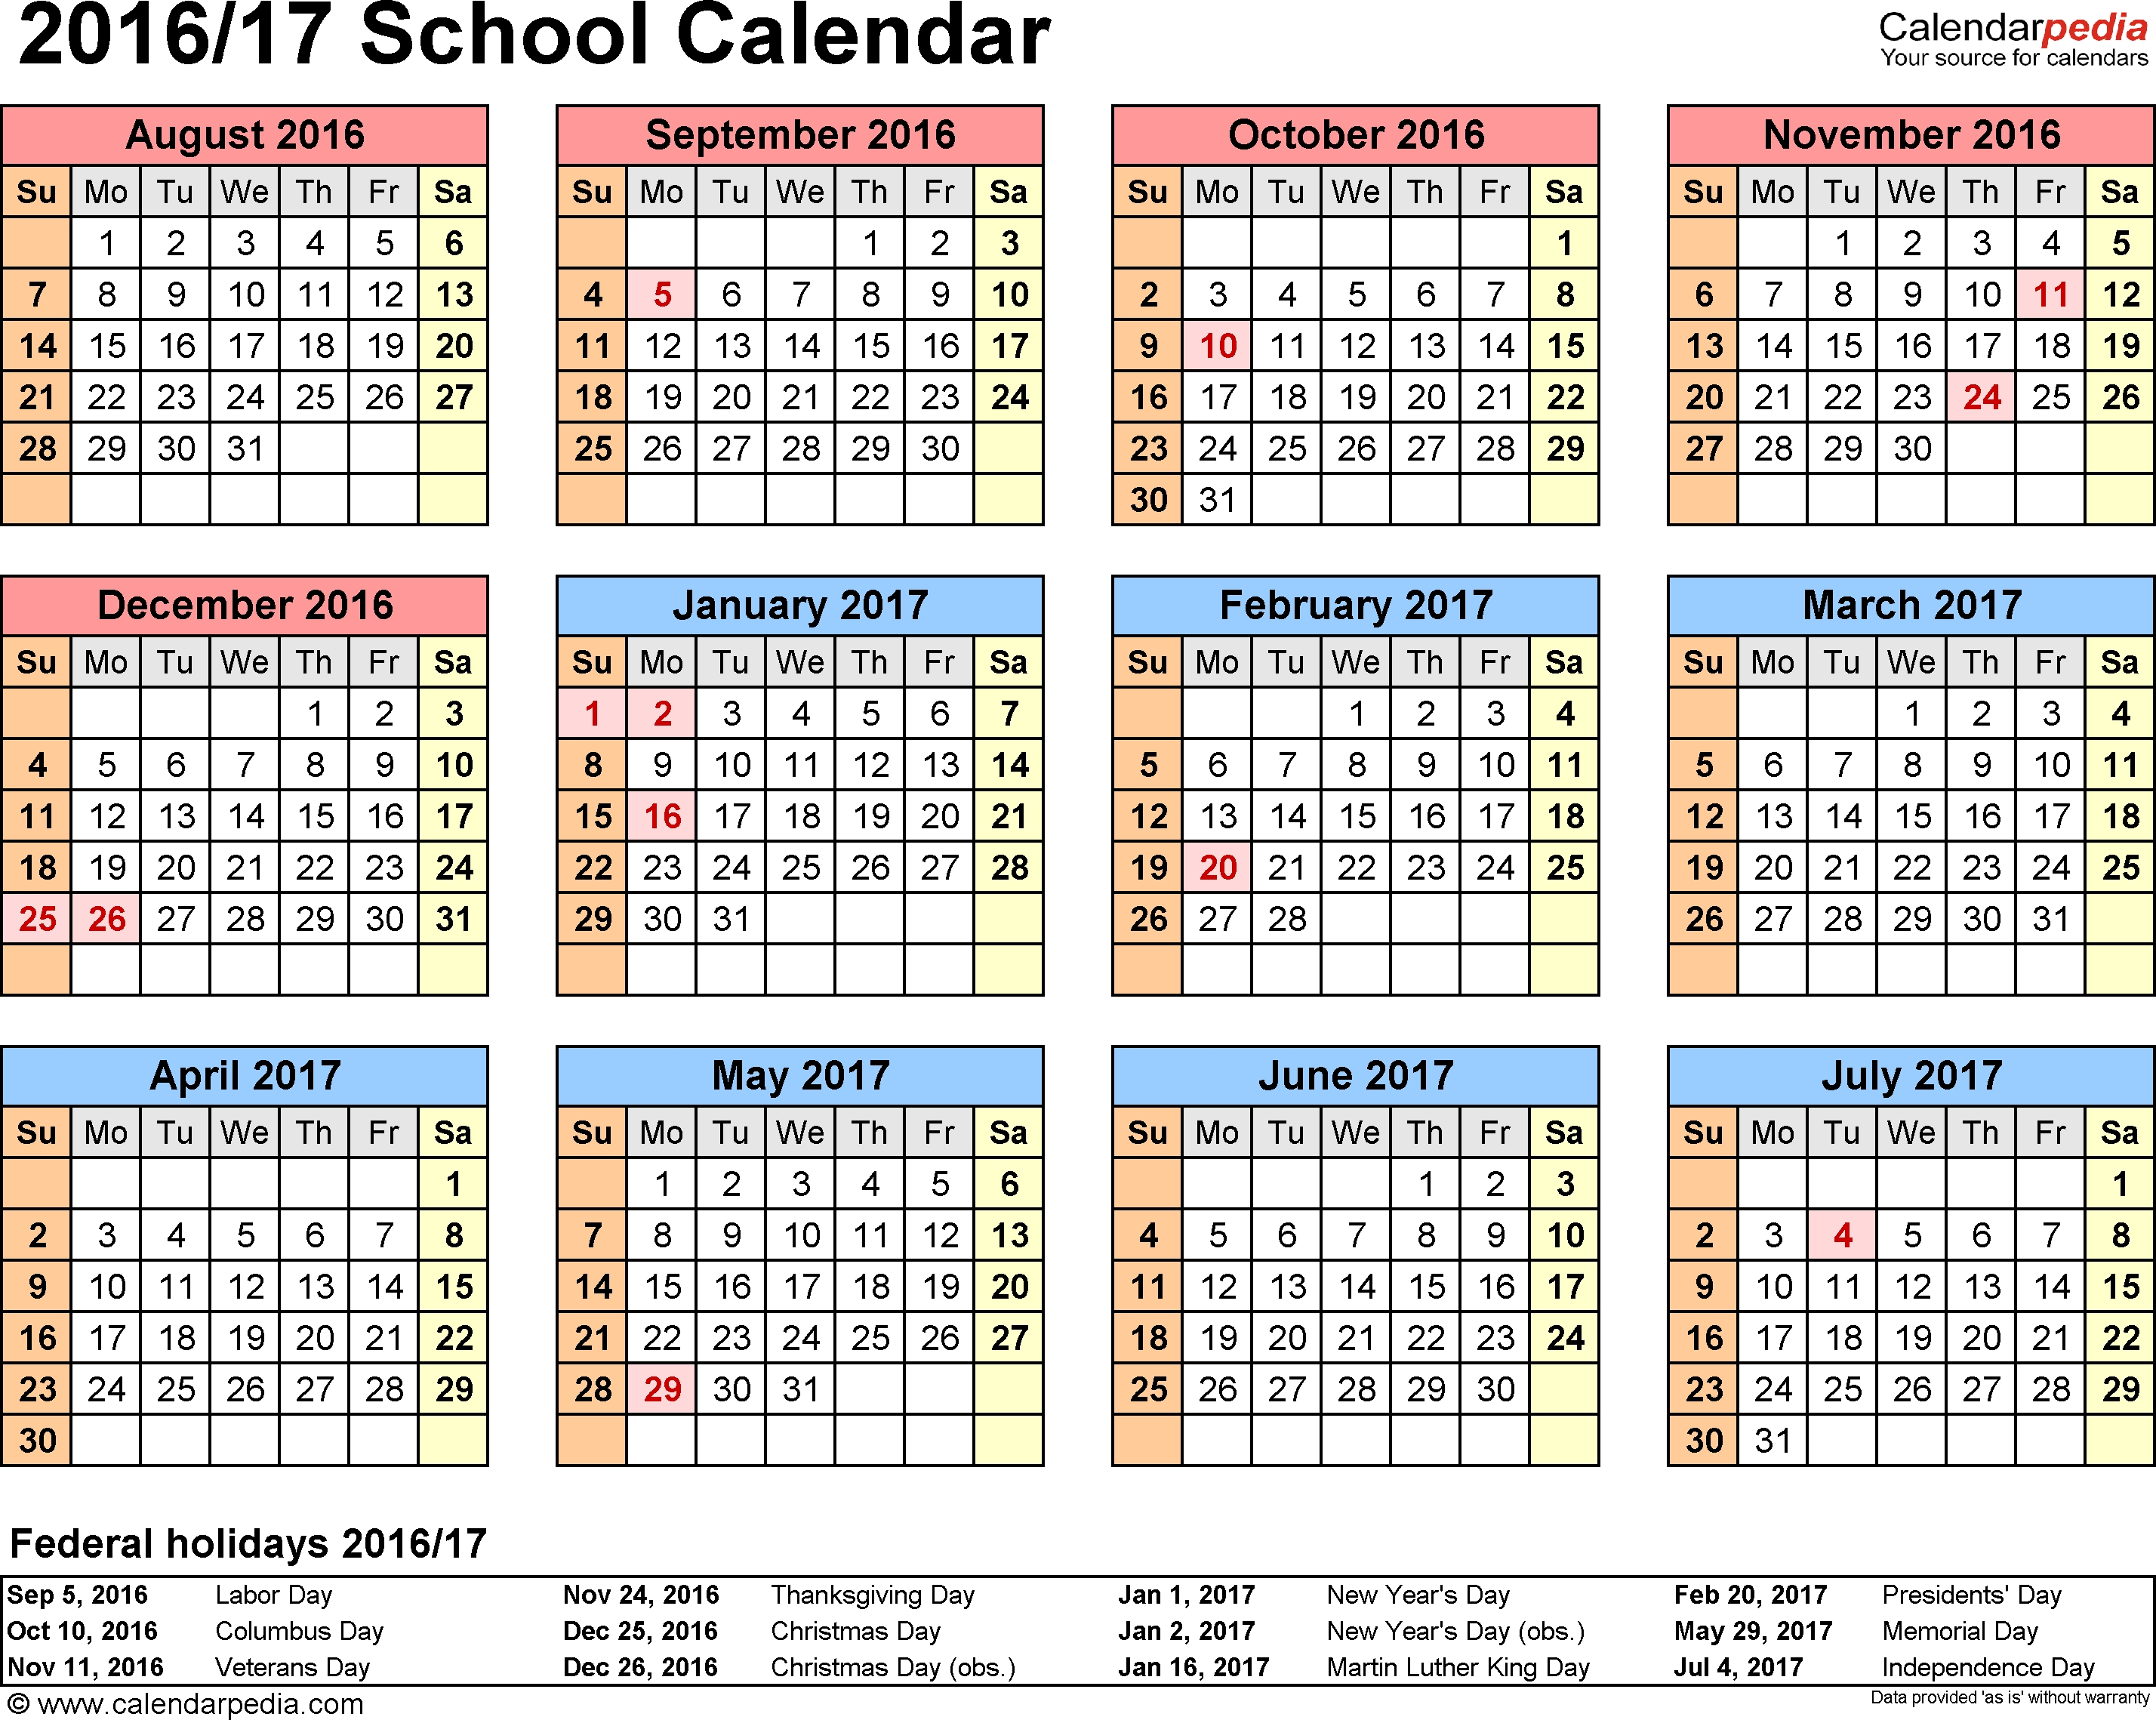 Free Calendar Template 2020 17 - Cerno.mioduchowski